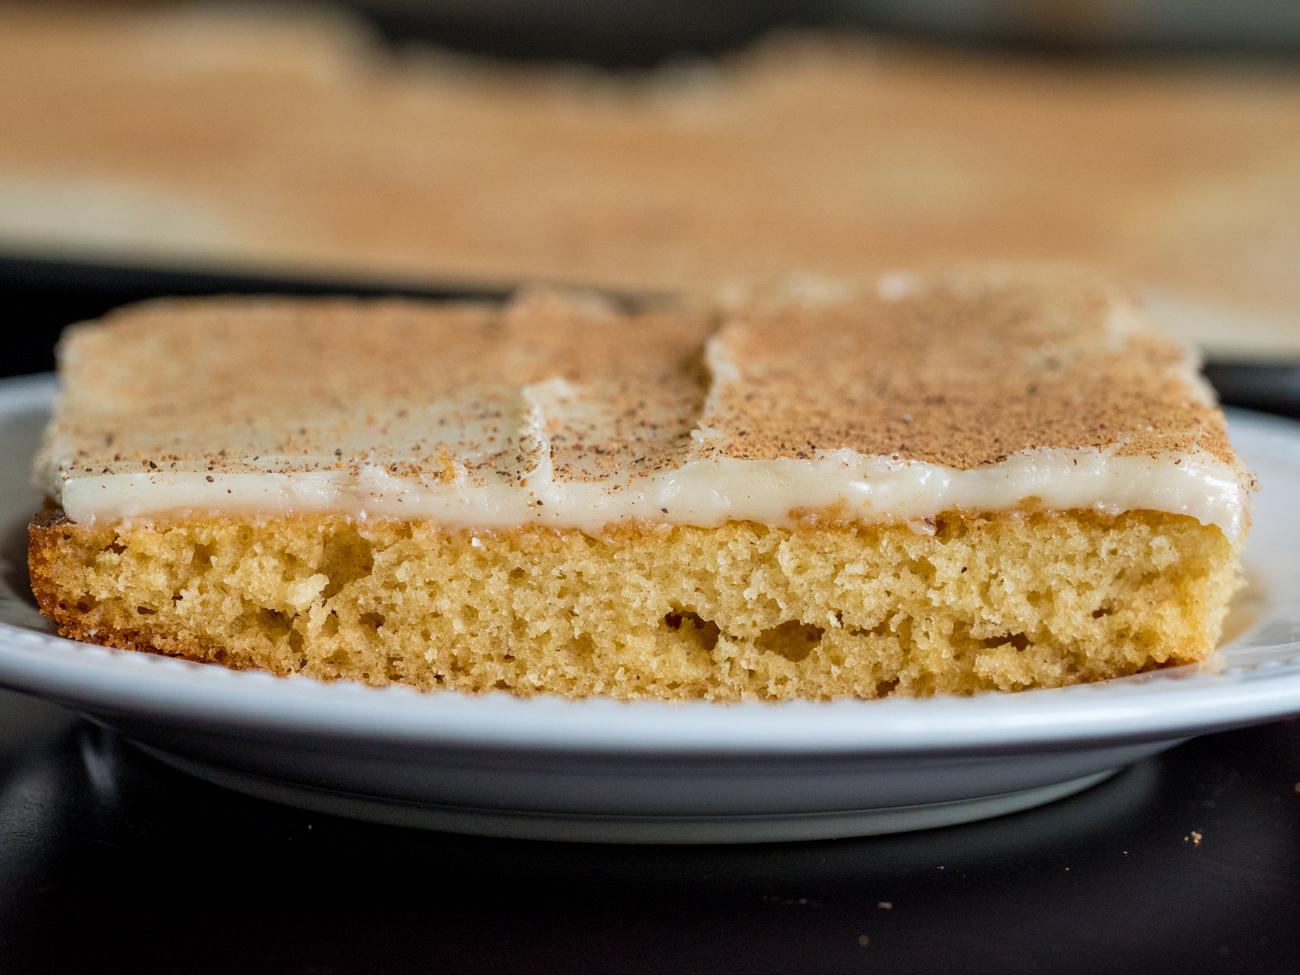 Eggnog Texas Sheetcake Horizontal 1